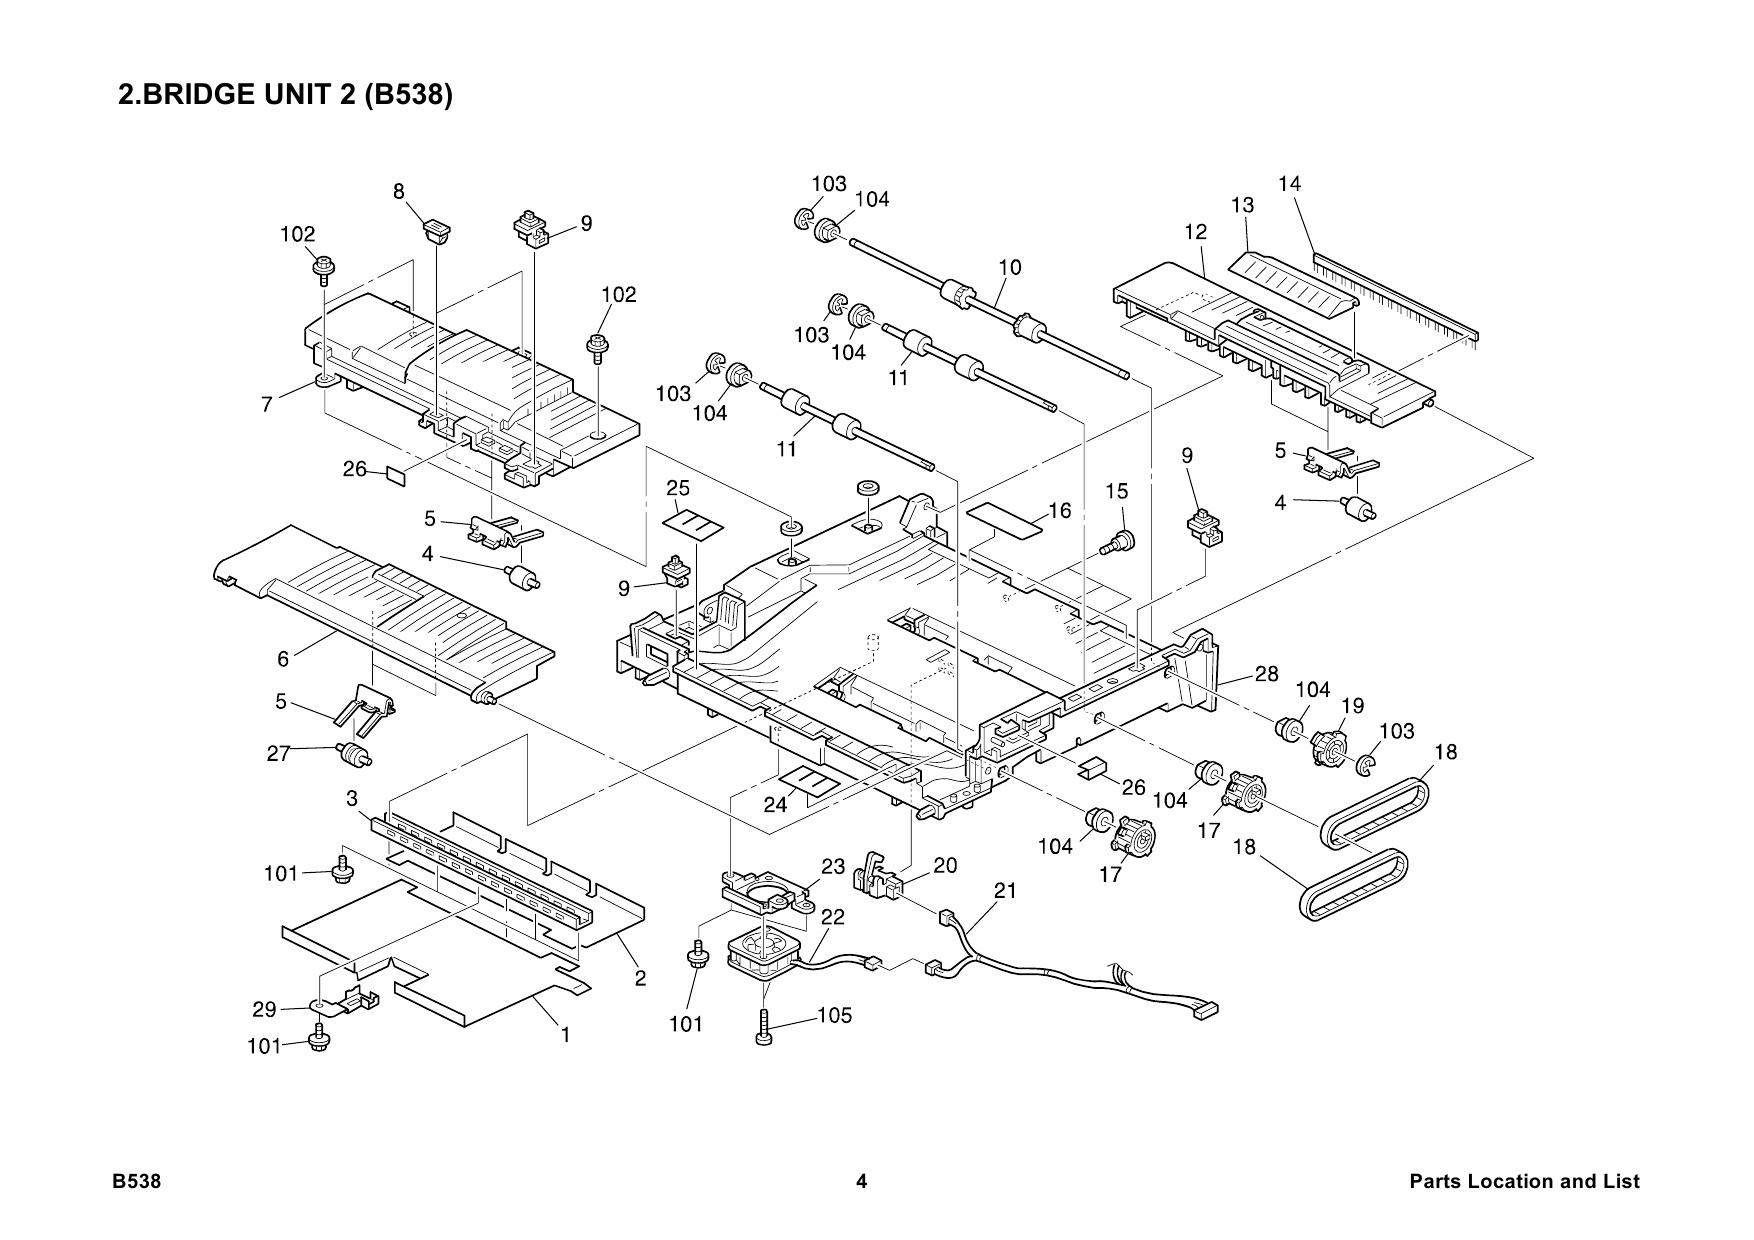 ricoh options b538 bridge